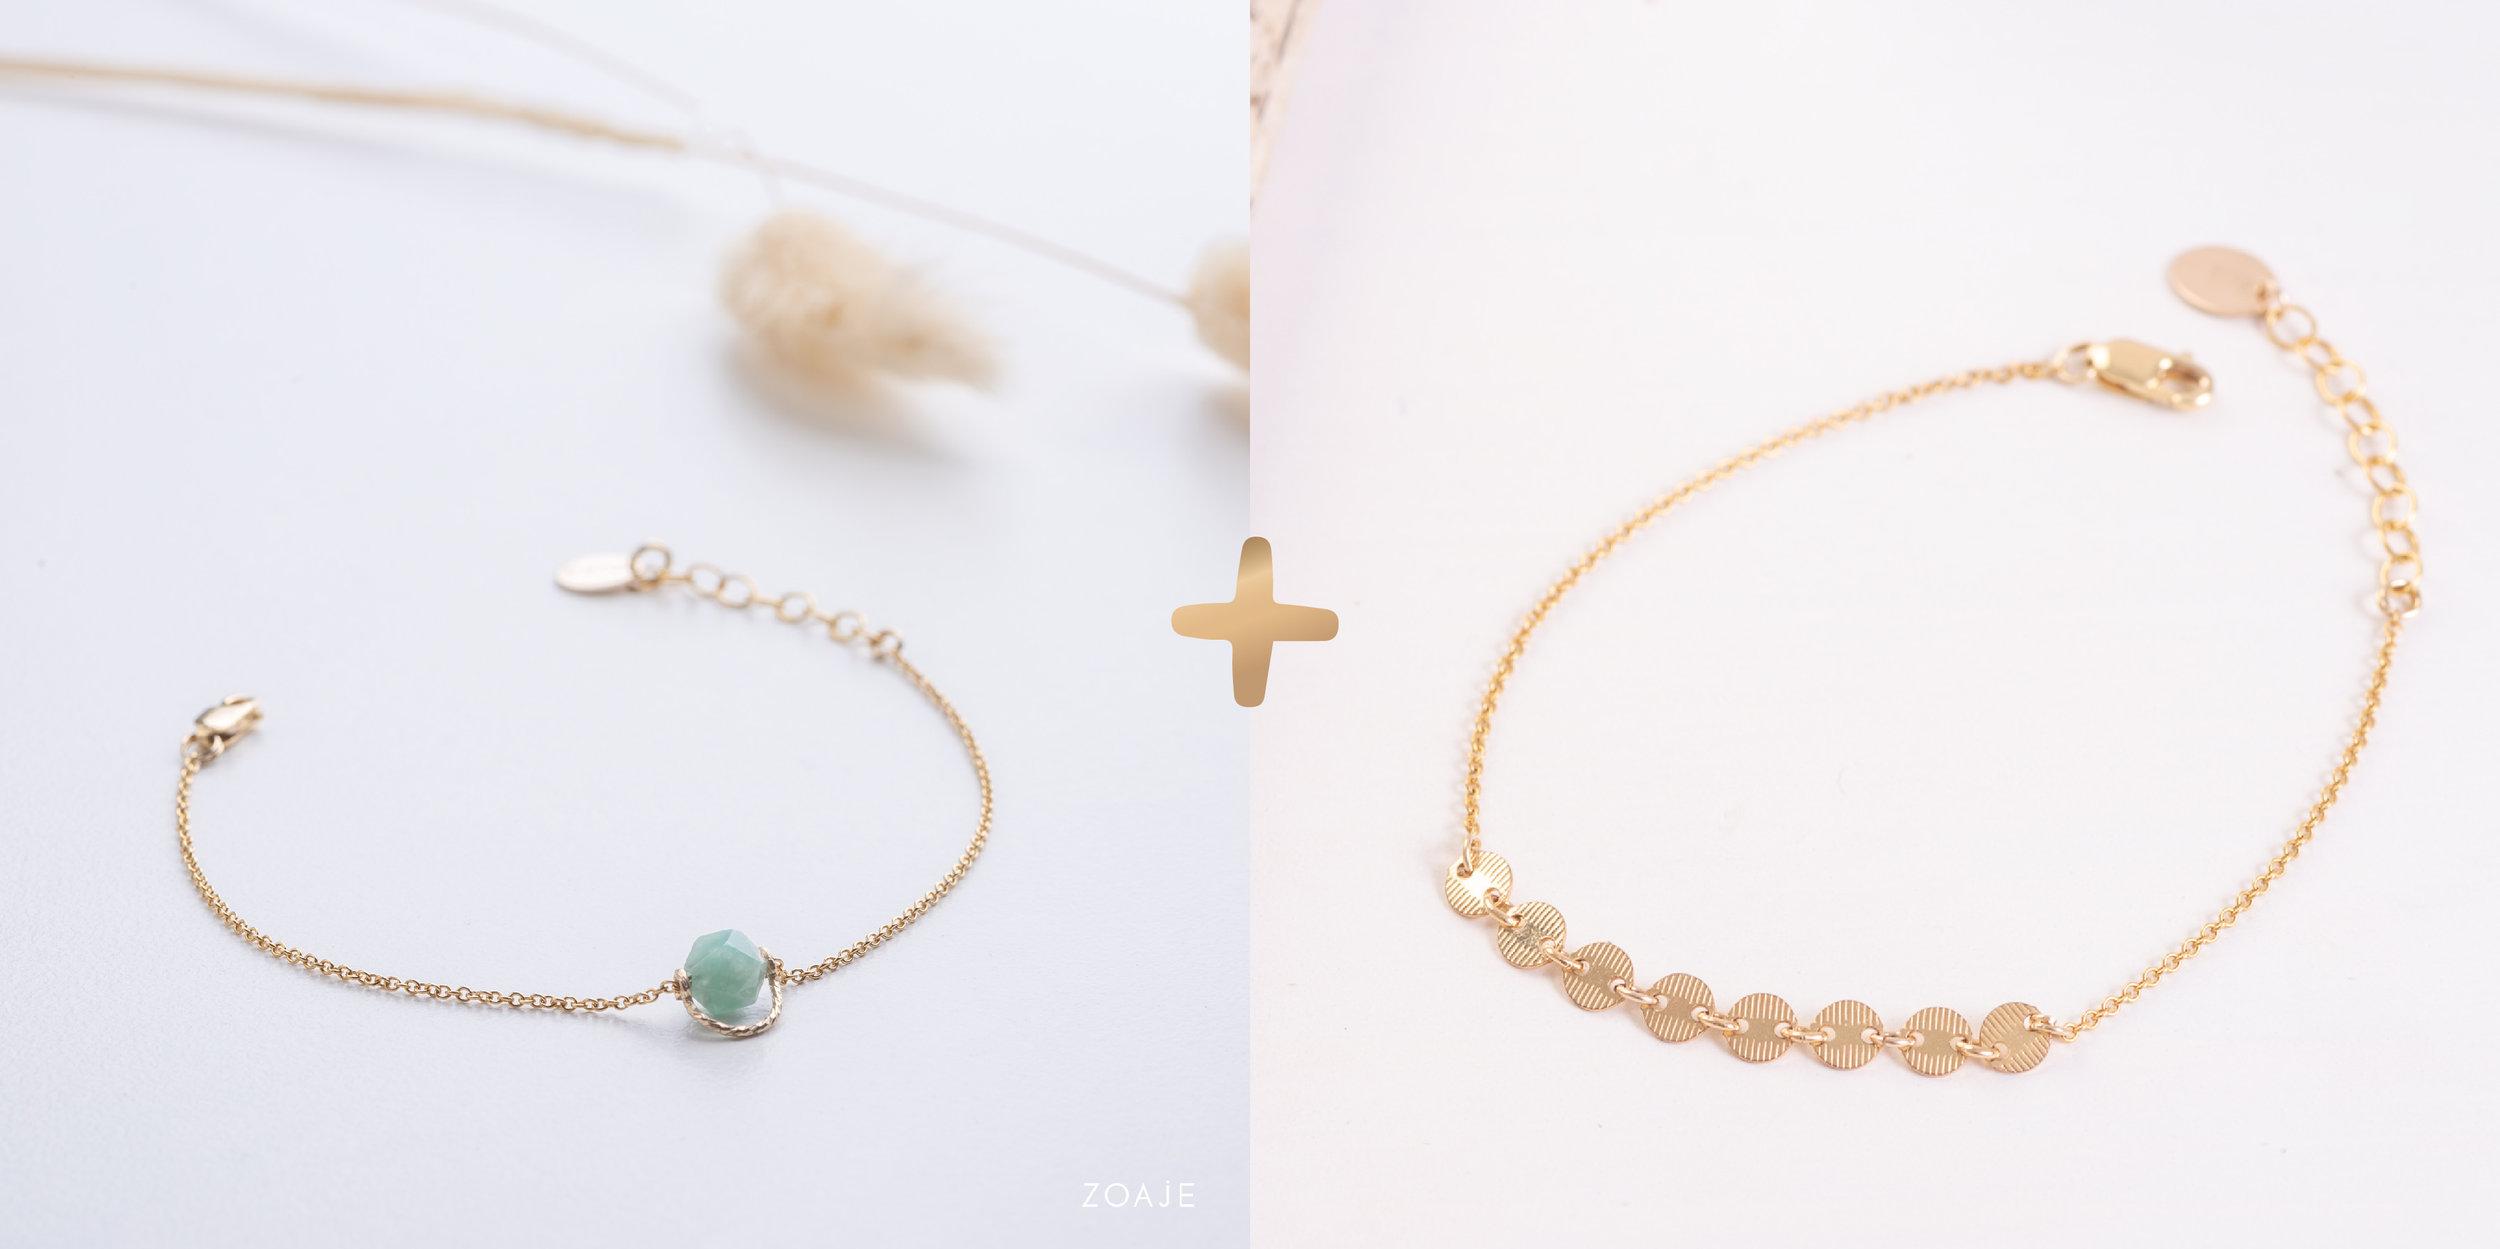 thailand + italy bracelet inspoArtboard 1@2x-100.jpg